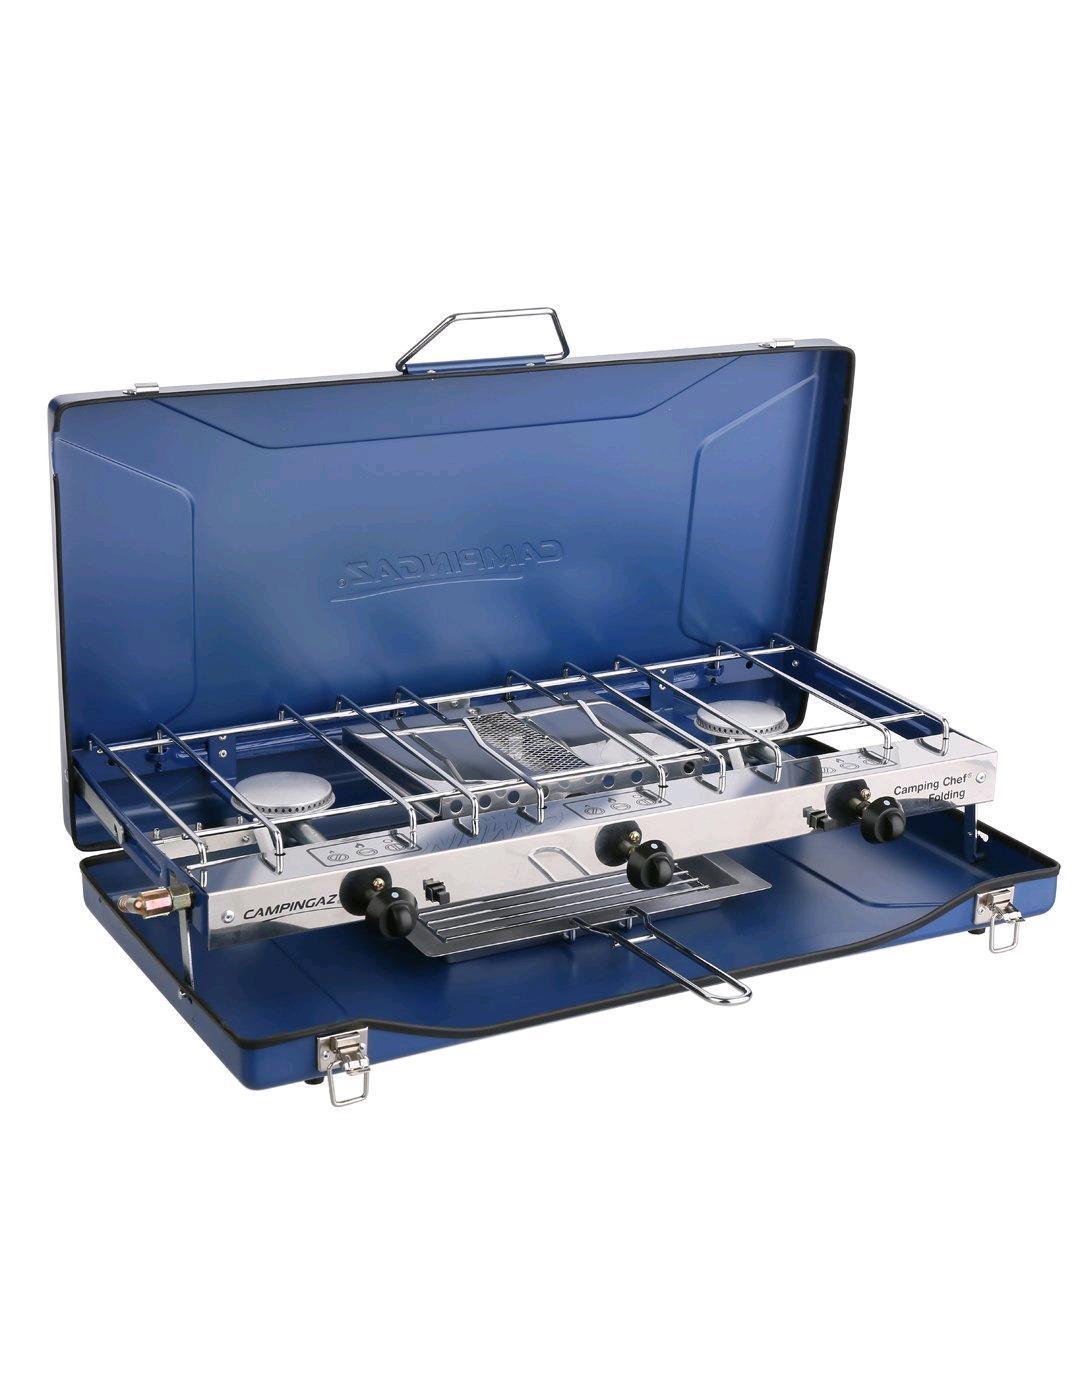 Caramarine 943078 Campingaz Camping Chef Folding Stove, Portable 2 Burner Stove 2 x 1.500 Watt, Compact Outdoor Toaster Grill 1.200 Watt